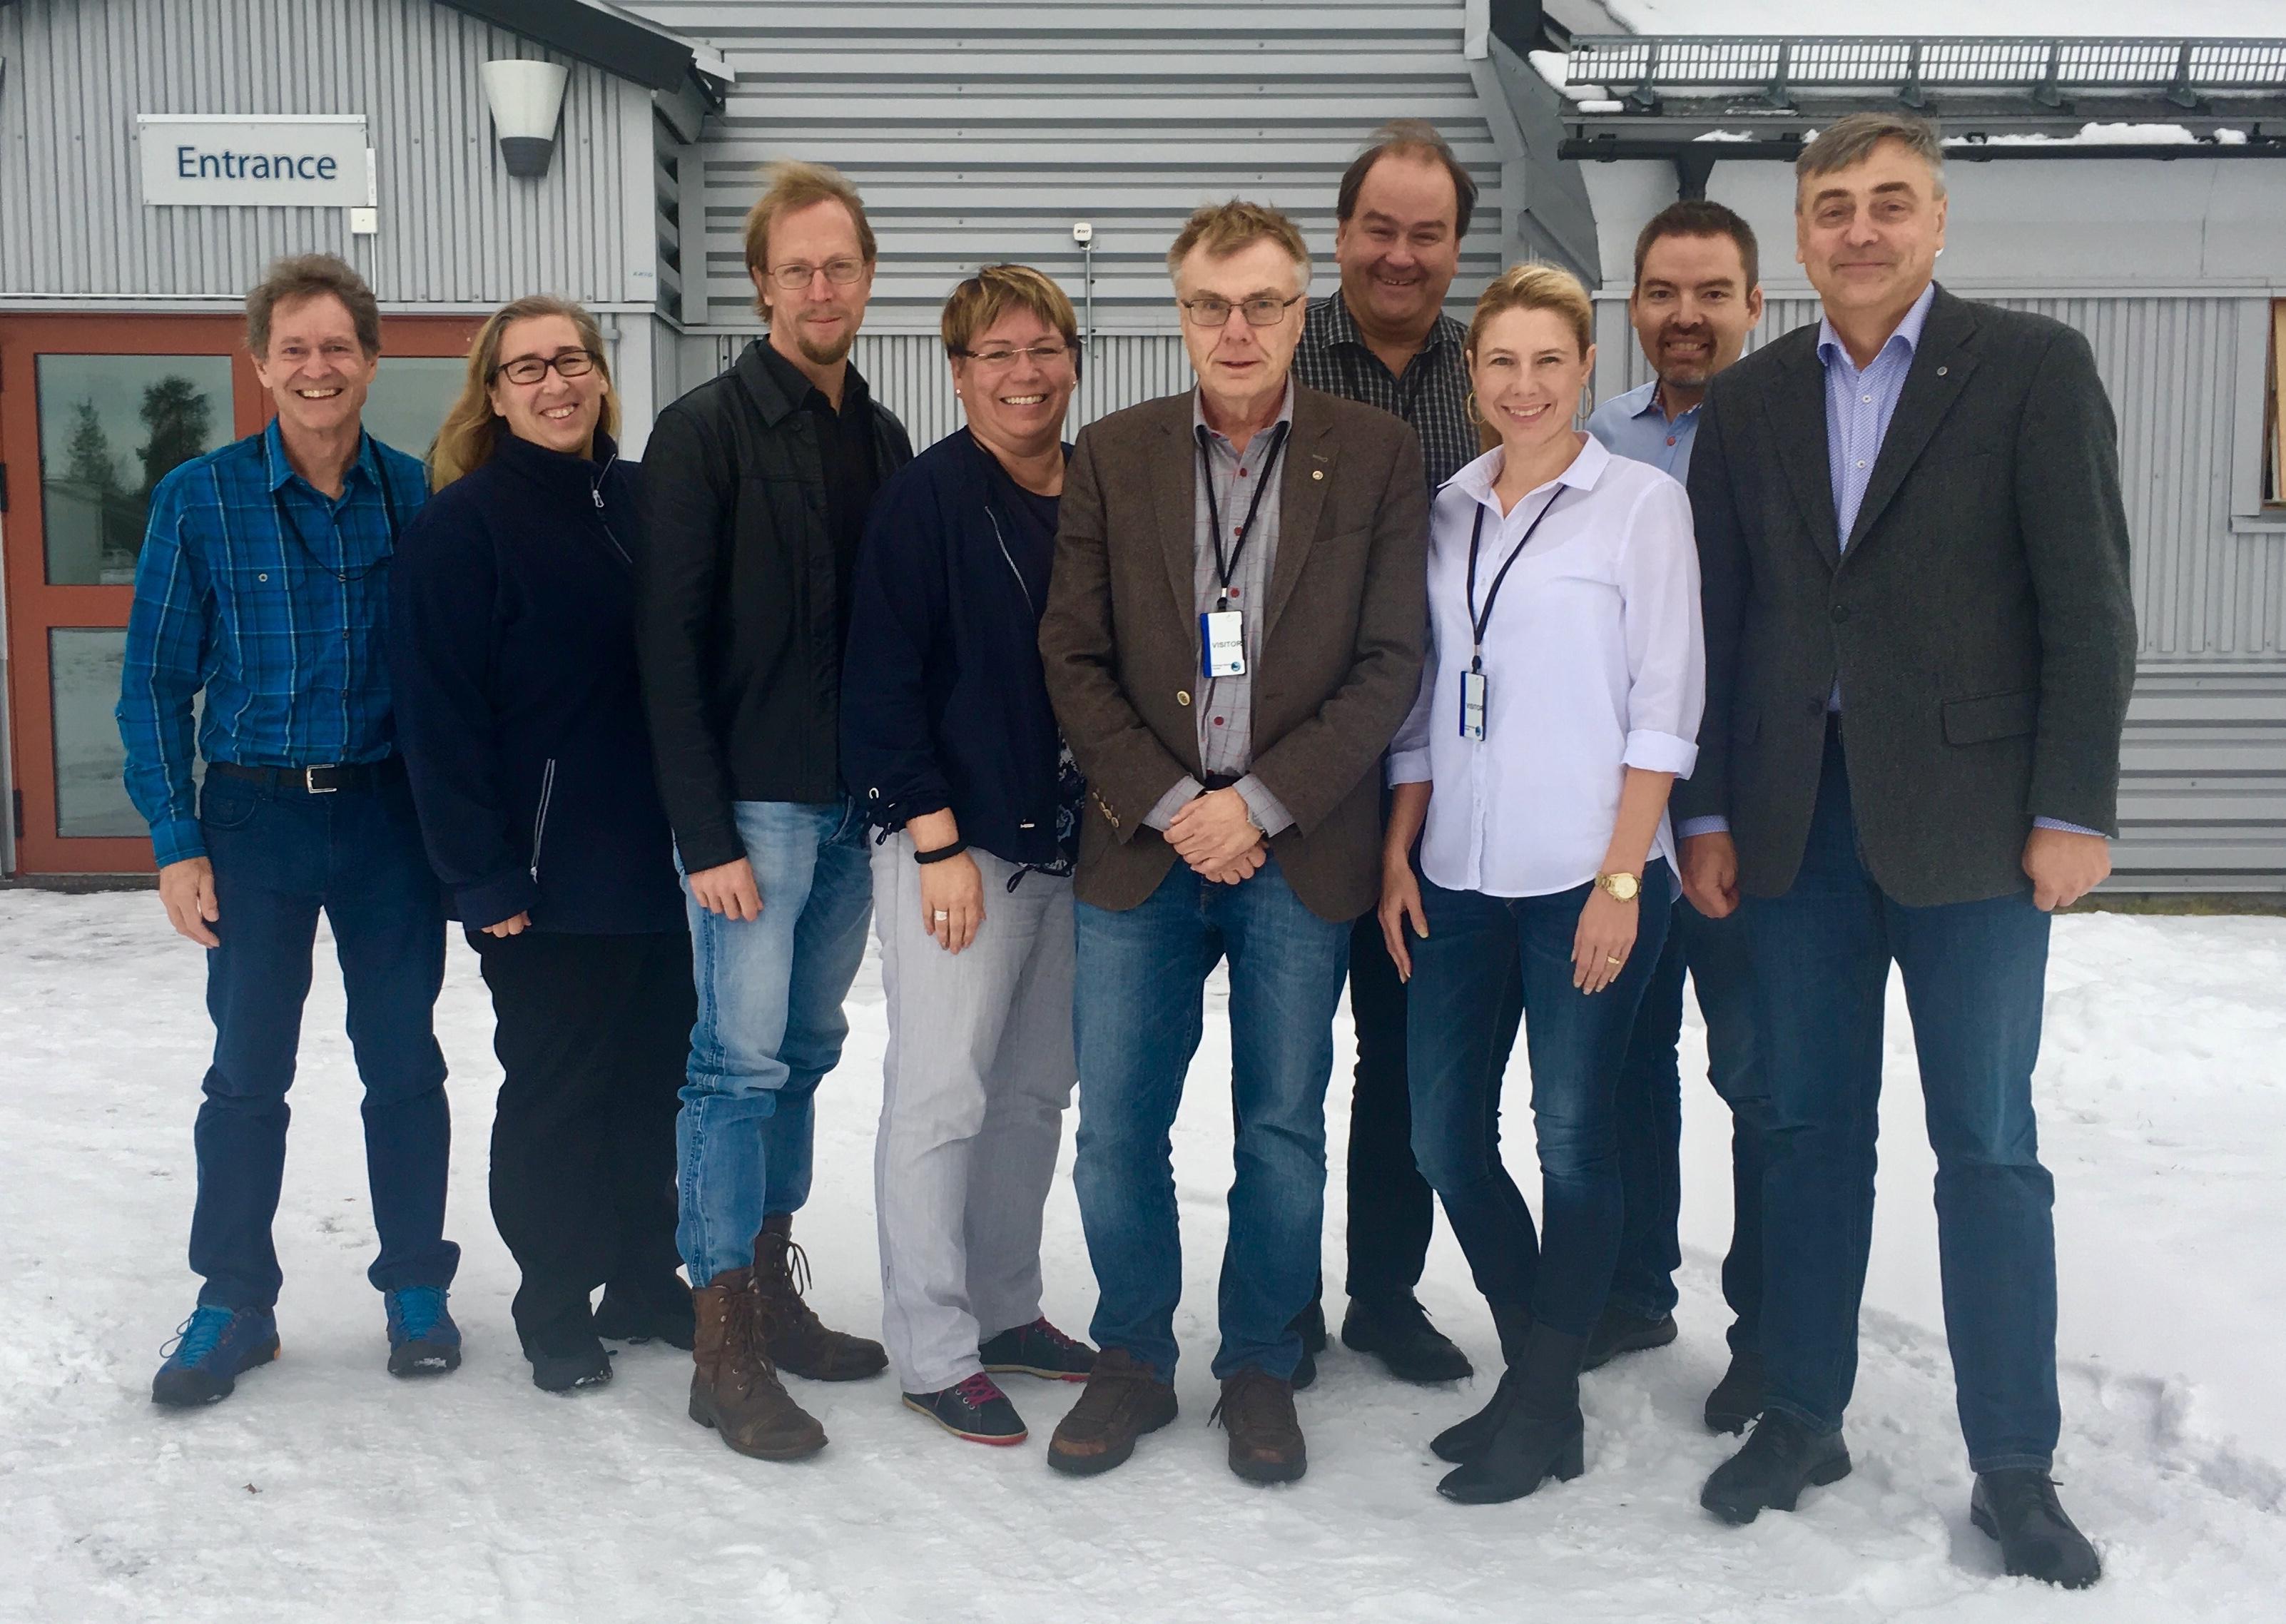 IRF's executive, from left: Rick McGregor, Ella Carlsson Sjöberg, Hans Nilsson, Anna-Karin Ukonsaari, Mats André, Urban Brändström, Cecilia Flemström, Johan Kero, Stas Barabash. (Photo: Maria Wästle, IRF)